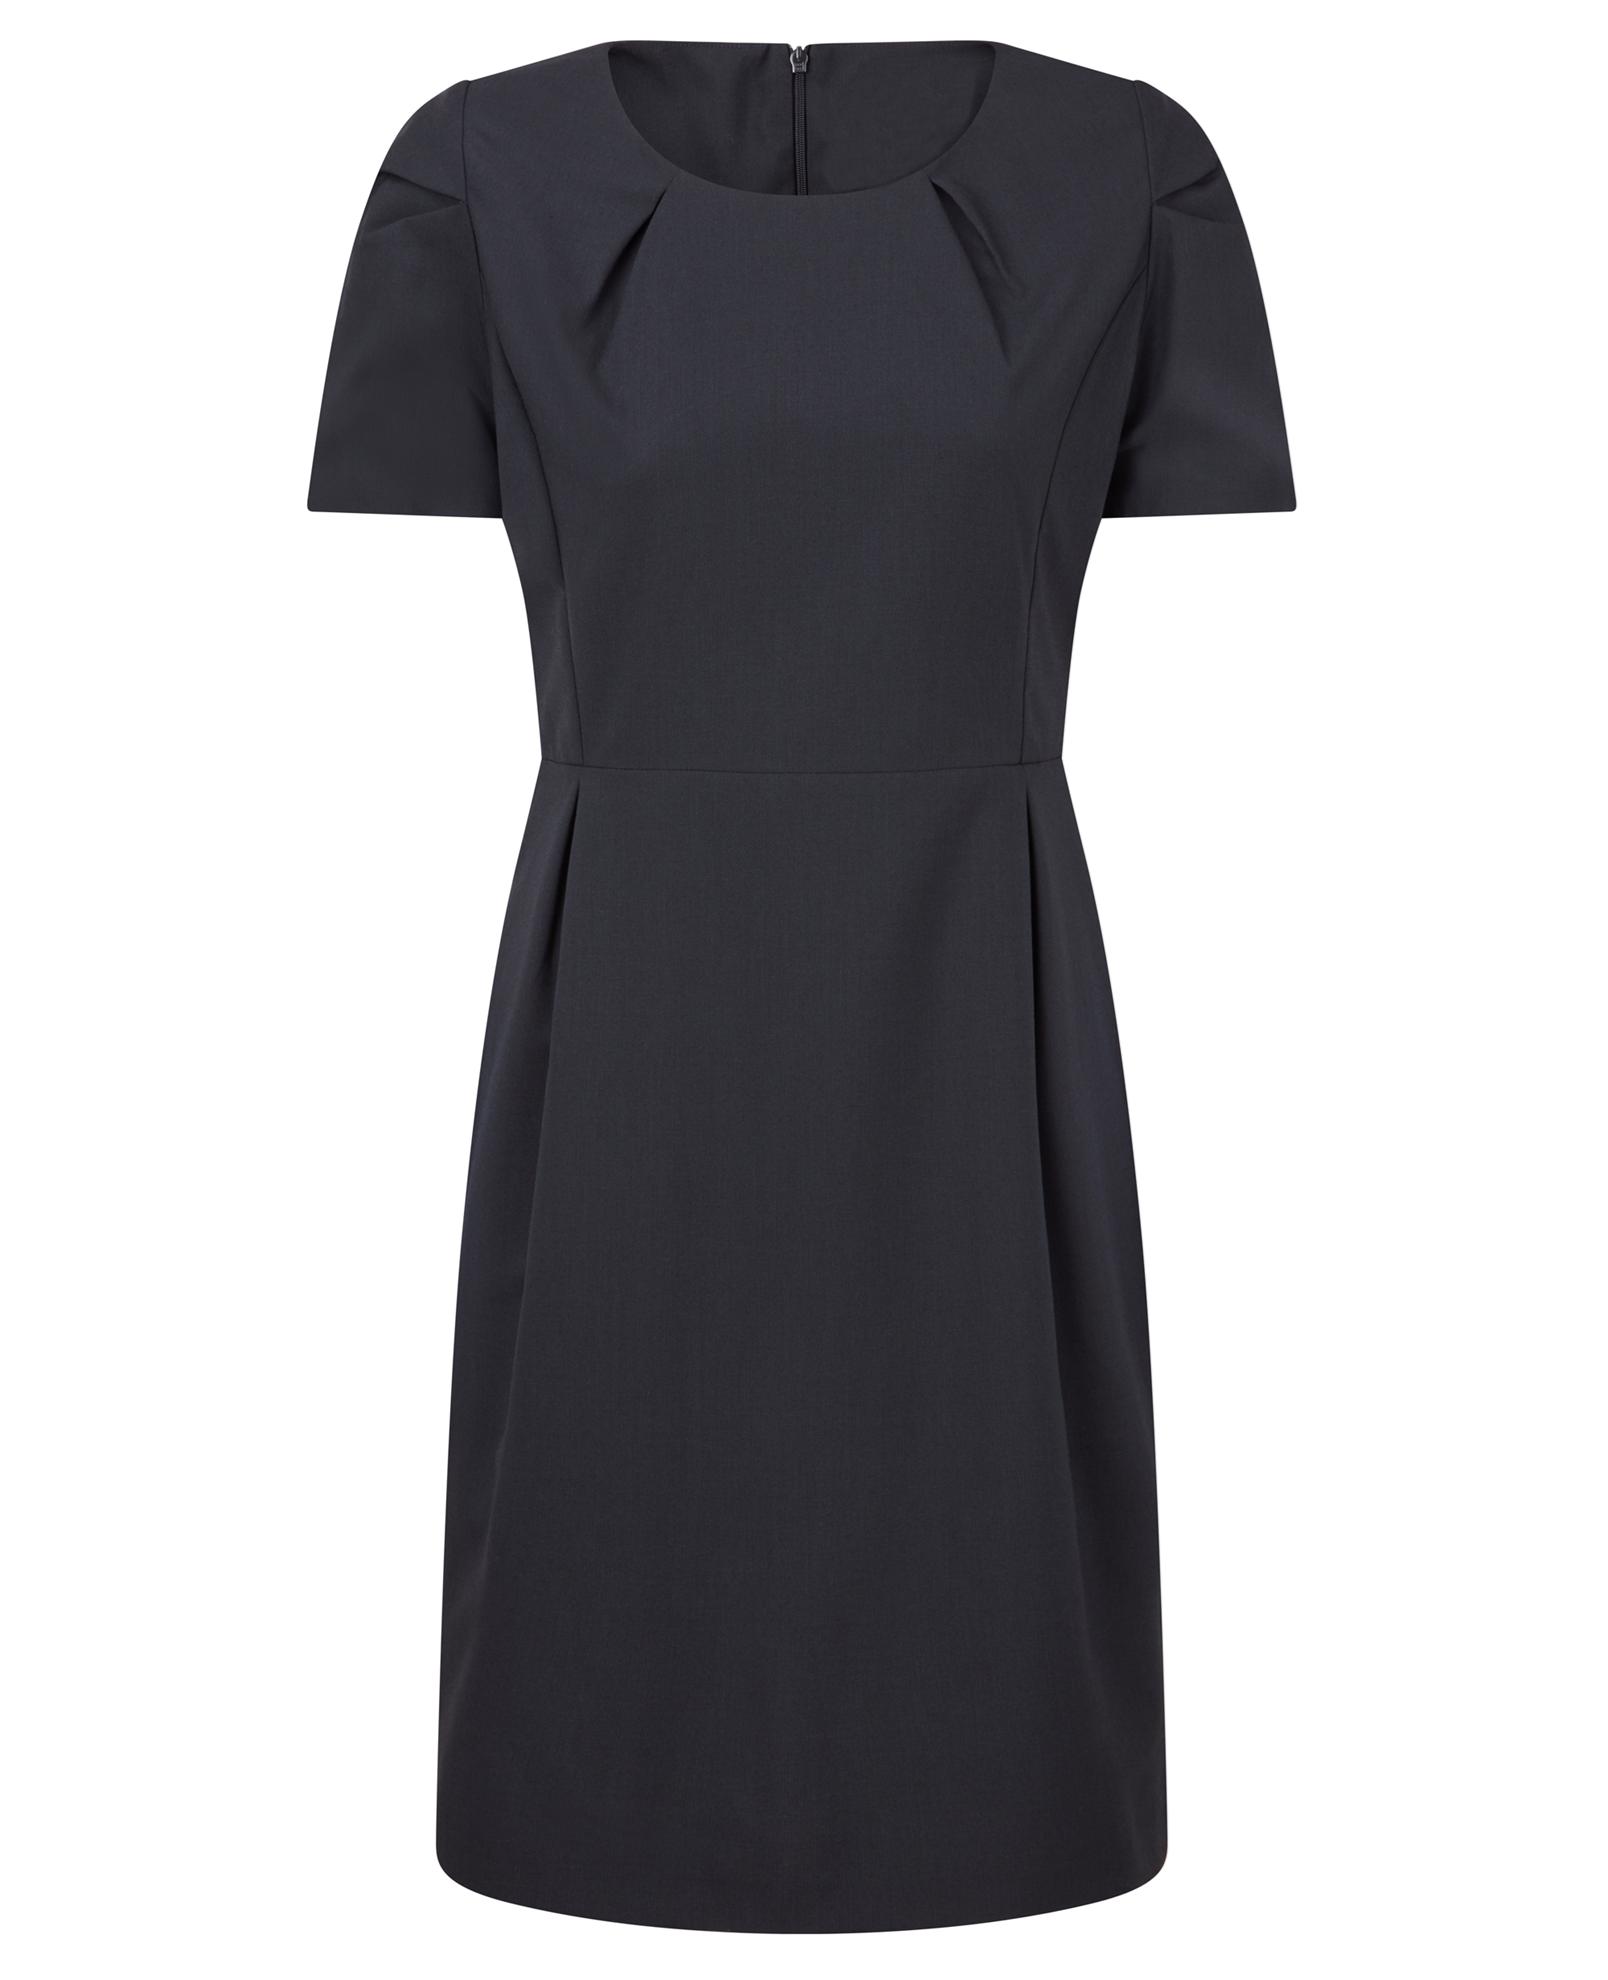 Picture of Primrose Dress - Black